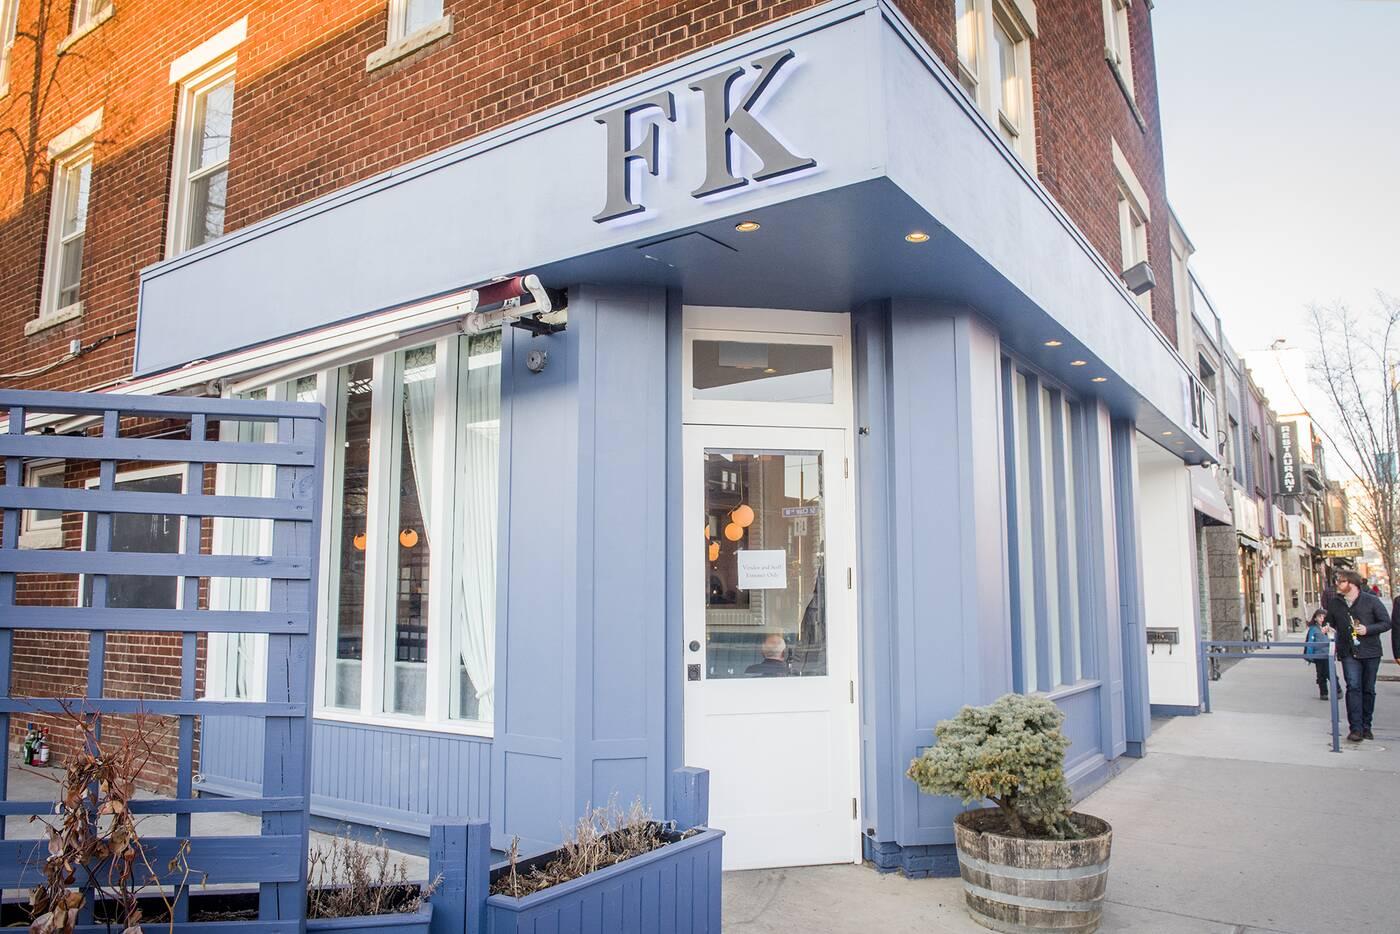 FK Toronto